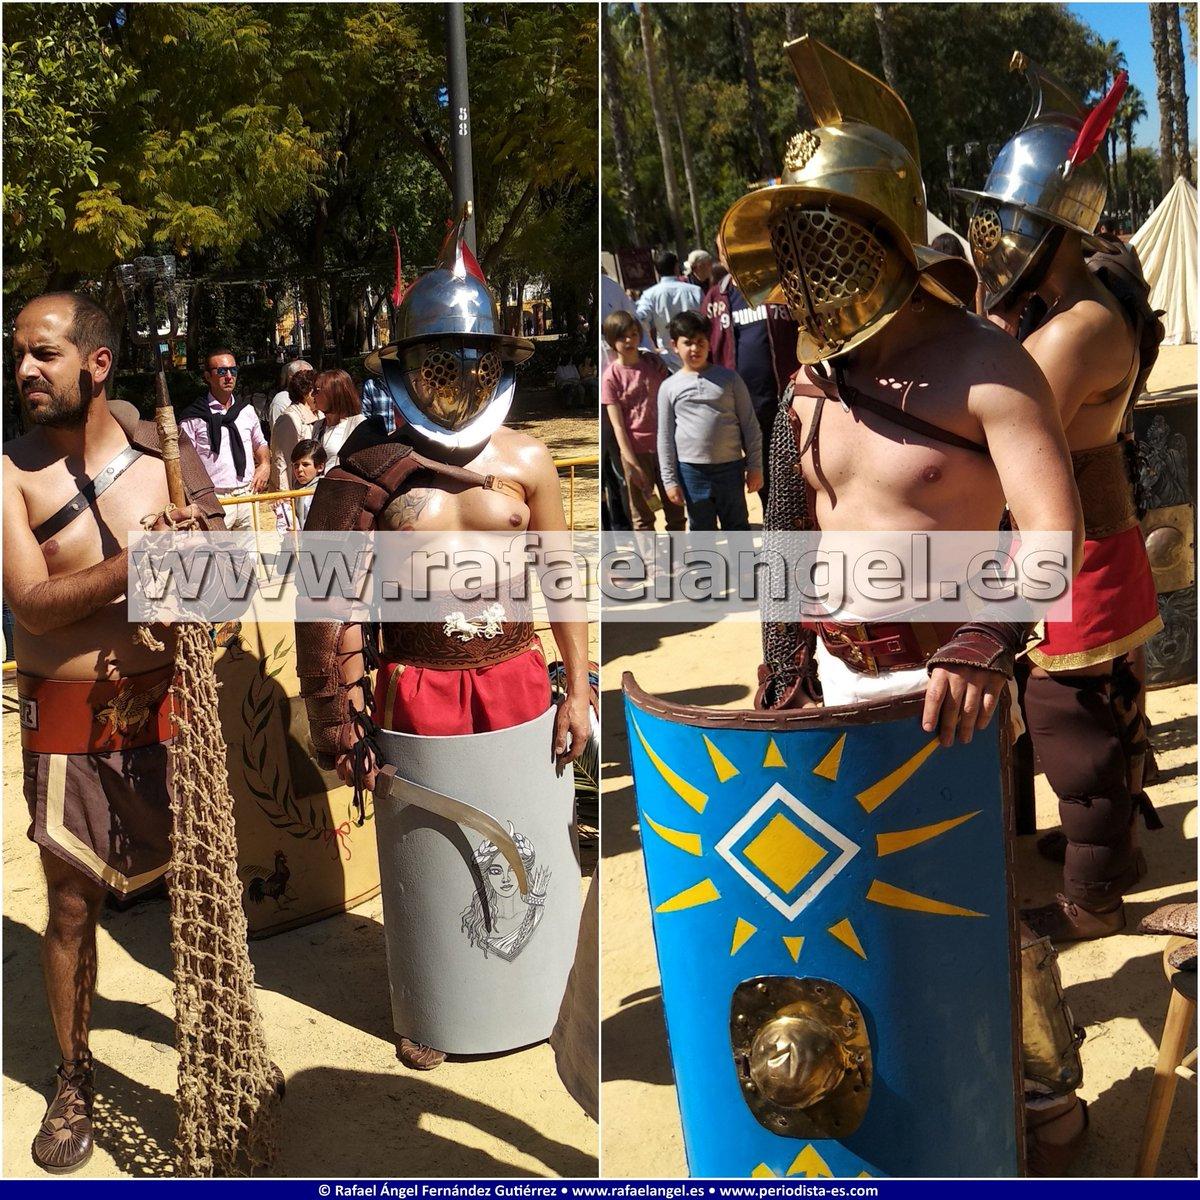 #Rome in #Seville MMXIX #RomeInSeville #RomeInSevilleMMXIX #RomanLegions #RomanSoldiers #Gladiators #Vestals #RomanCitizens #AncientRome #ClassicalRome #ImperialRome #RomanWorld @VlpiaAelia @HispaniaRomana @EgoFemina @Ayto_Sevilla http://bit.ly/romaensevillafb http://bit.ly/romaensevillafk